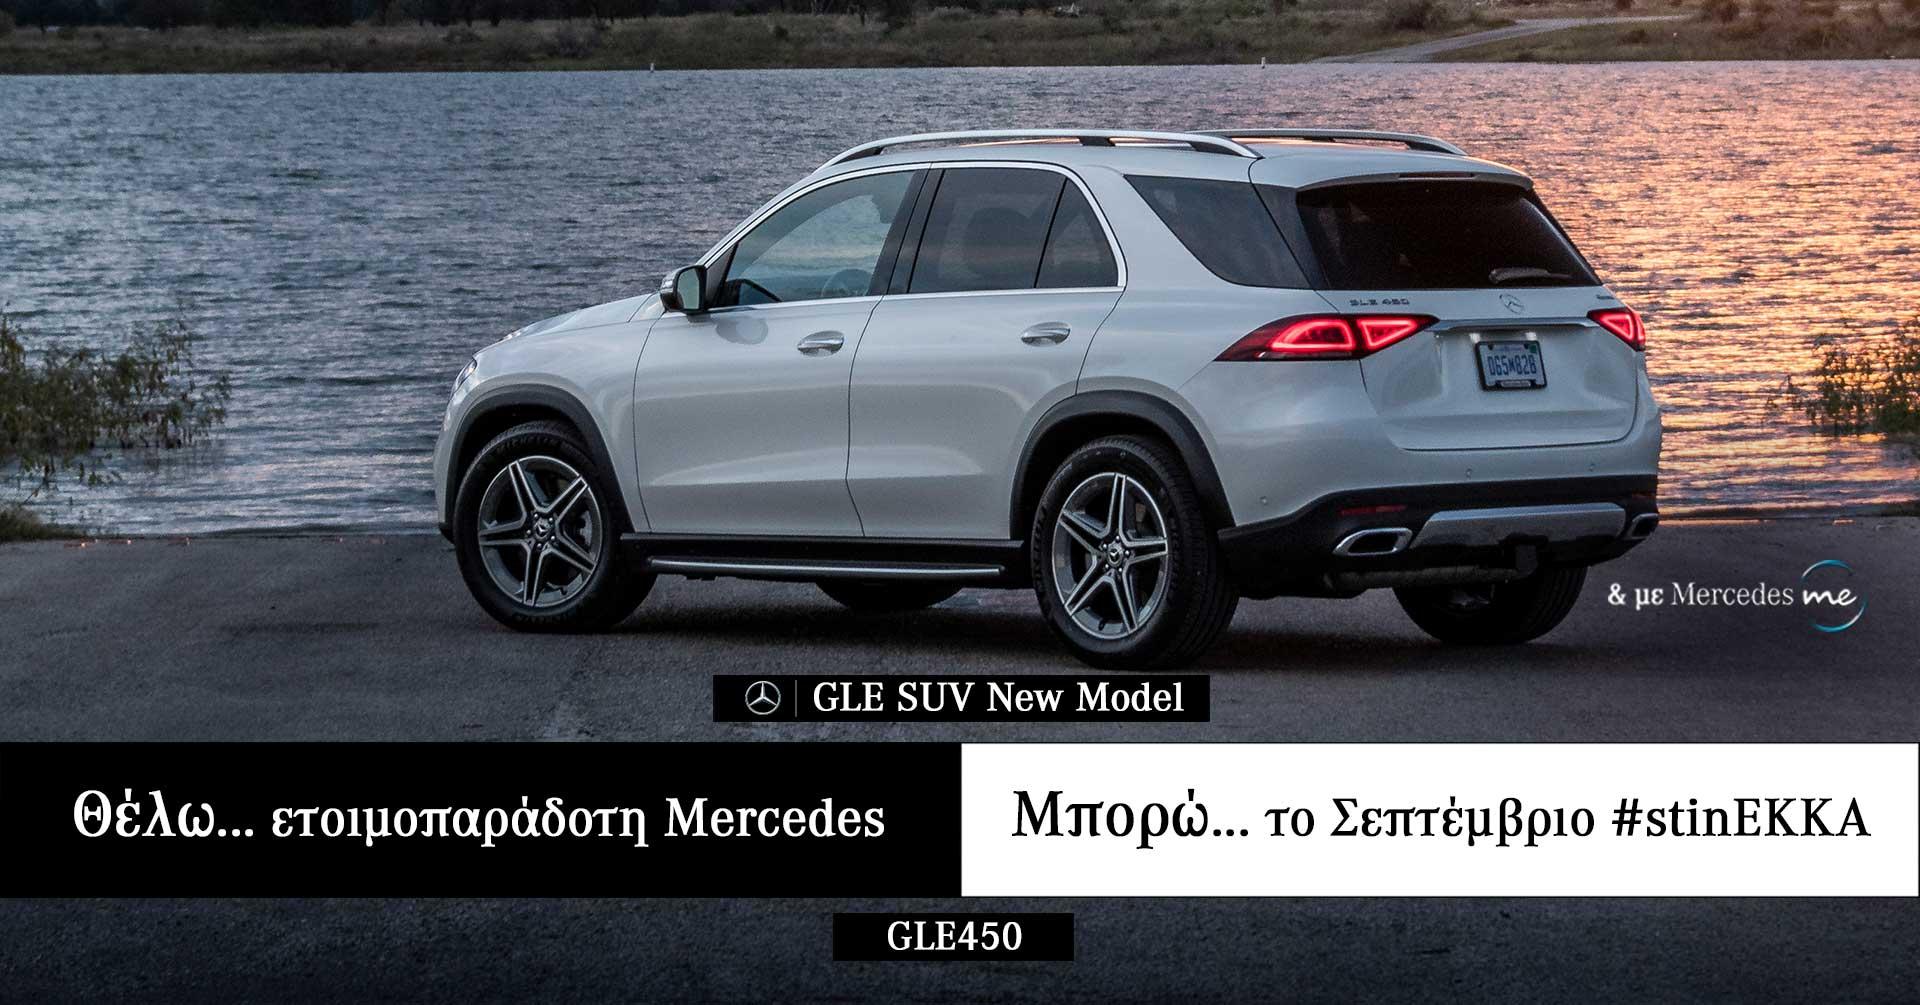 GLE SUV